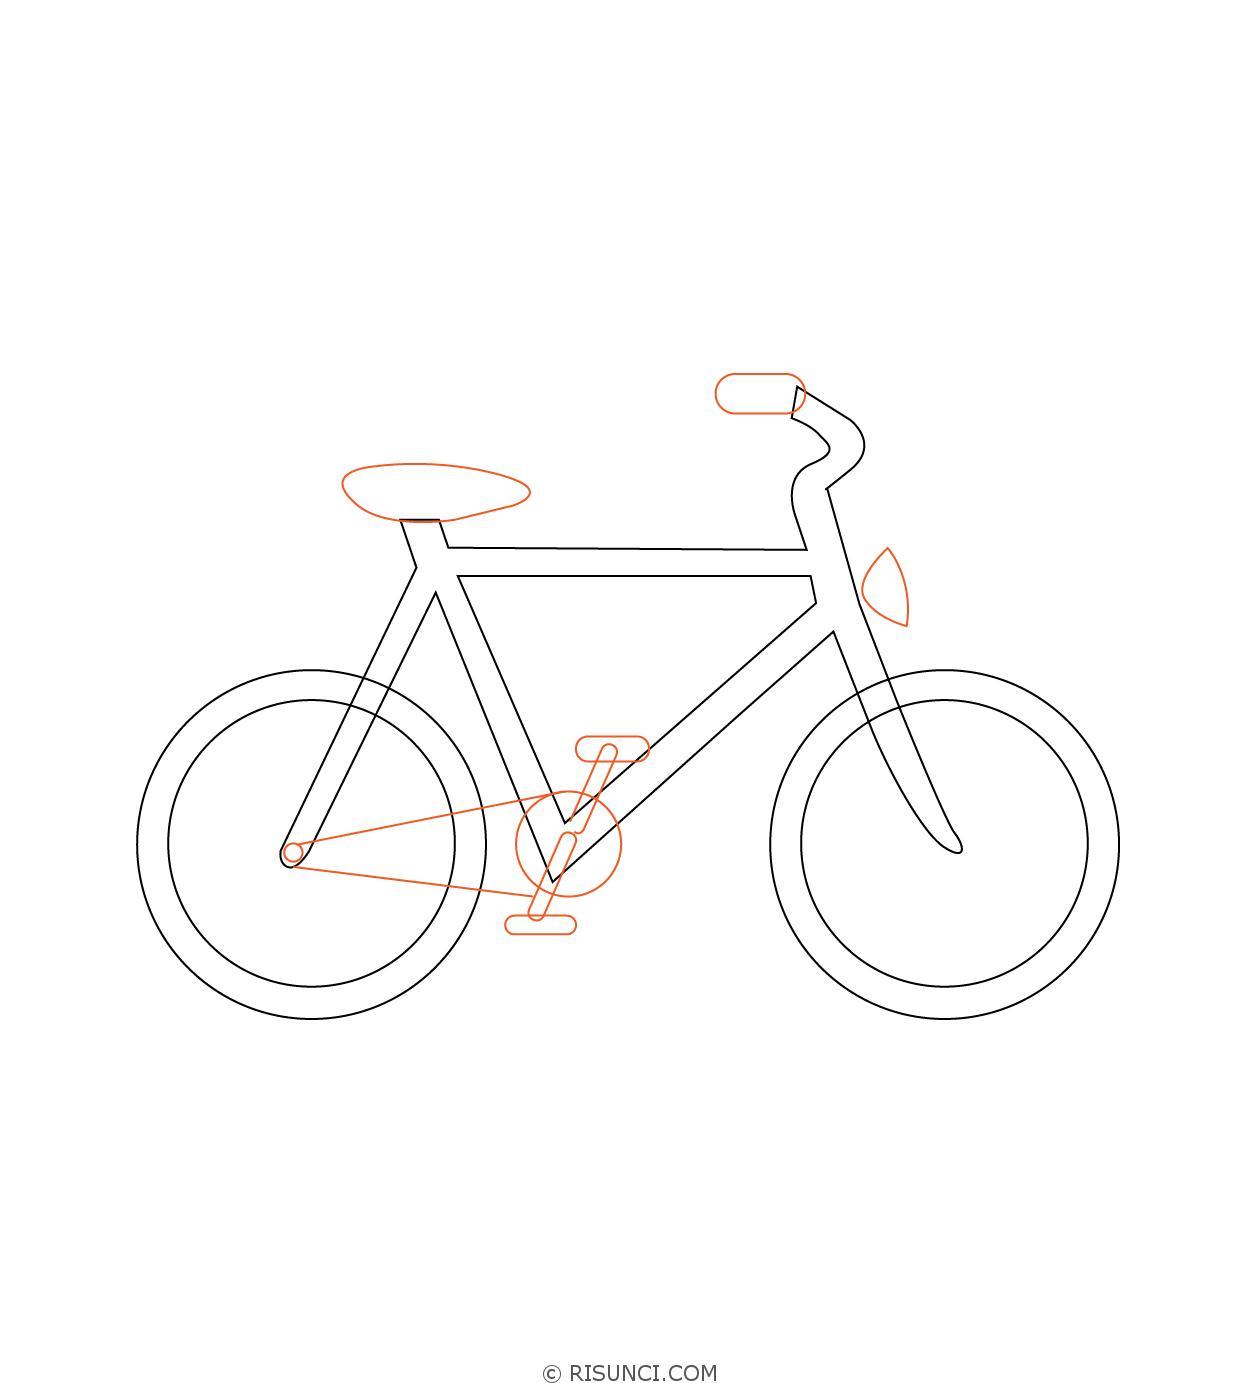 велосипед картинки для рисования зря такую кольцевую